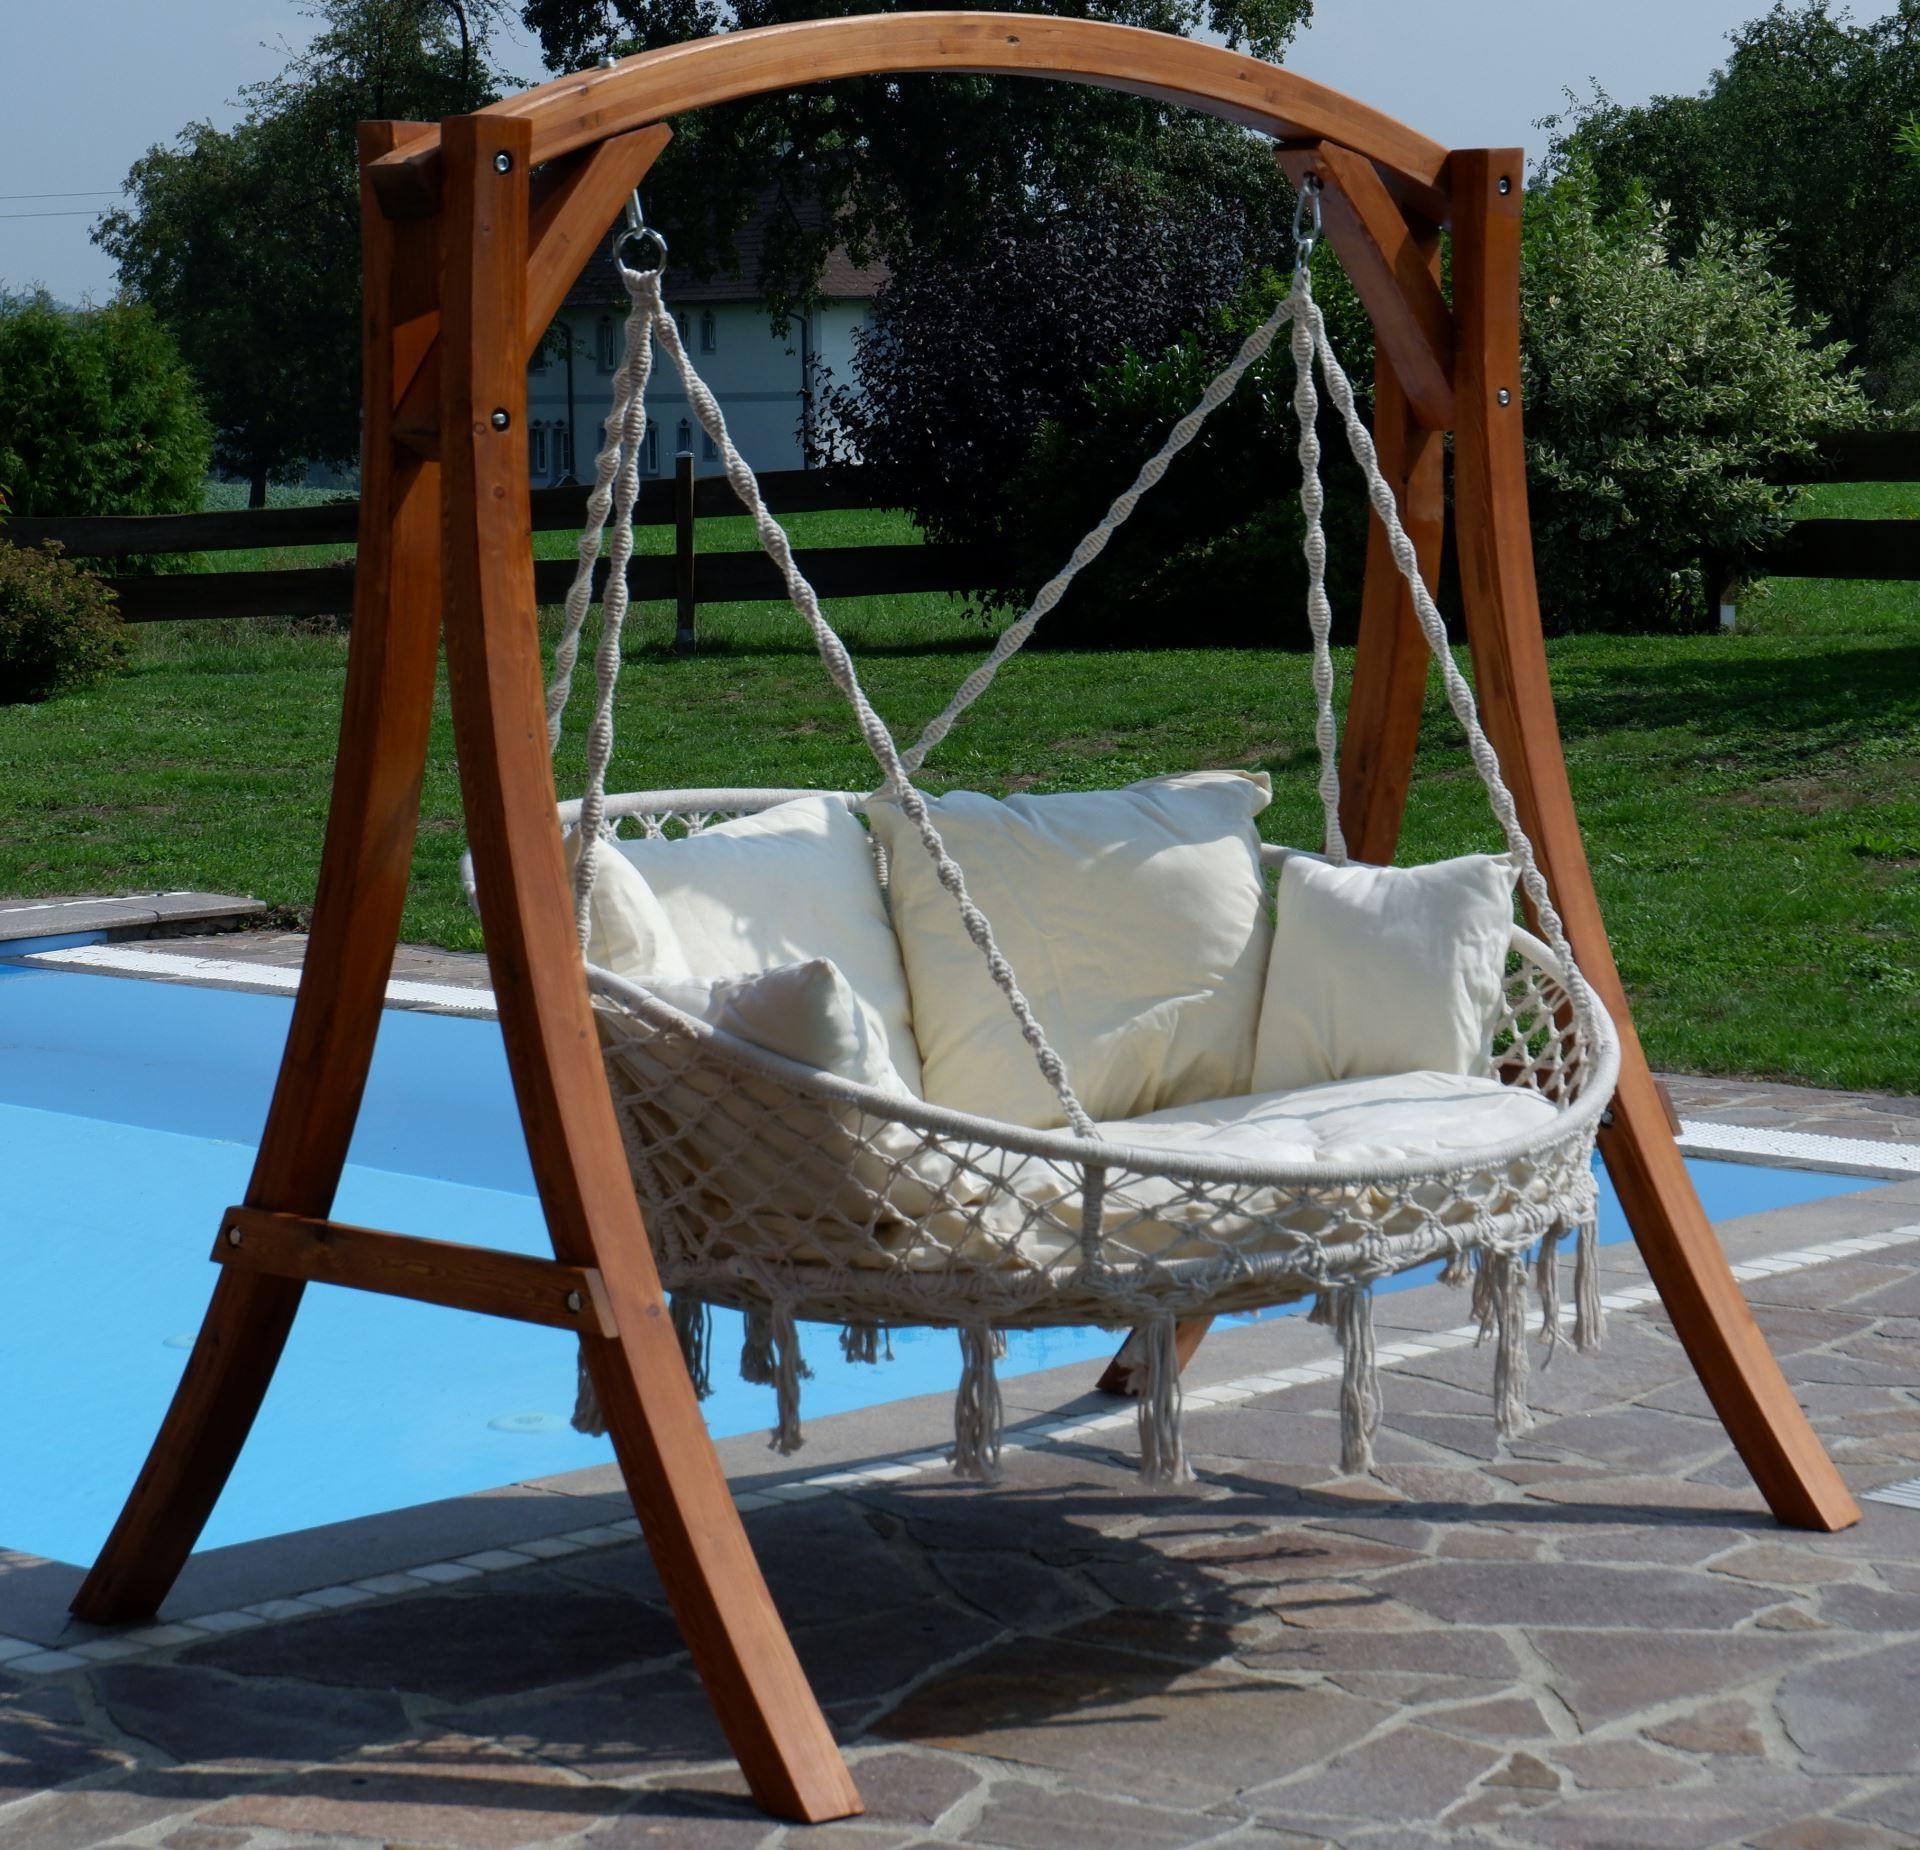 Hängesessel Hängelounger Doppellounger Lounge Für 2 Personen Throughout Popular 2 Person Hammered Bronze Iron Outdoor Swings (View 14 of 25)